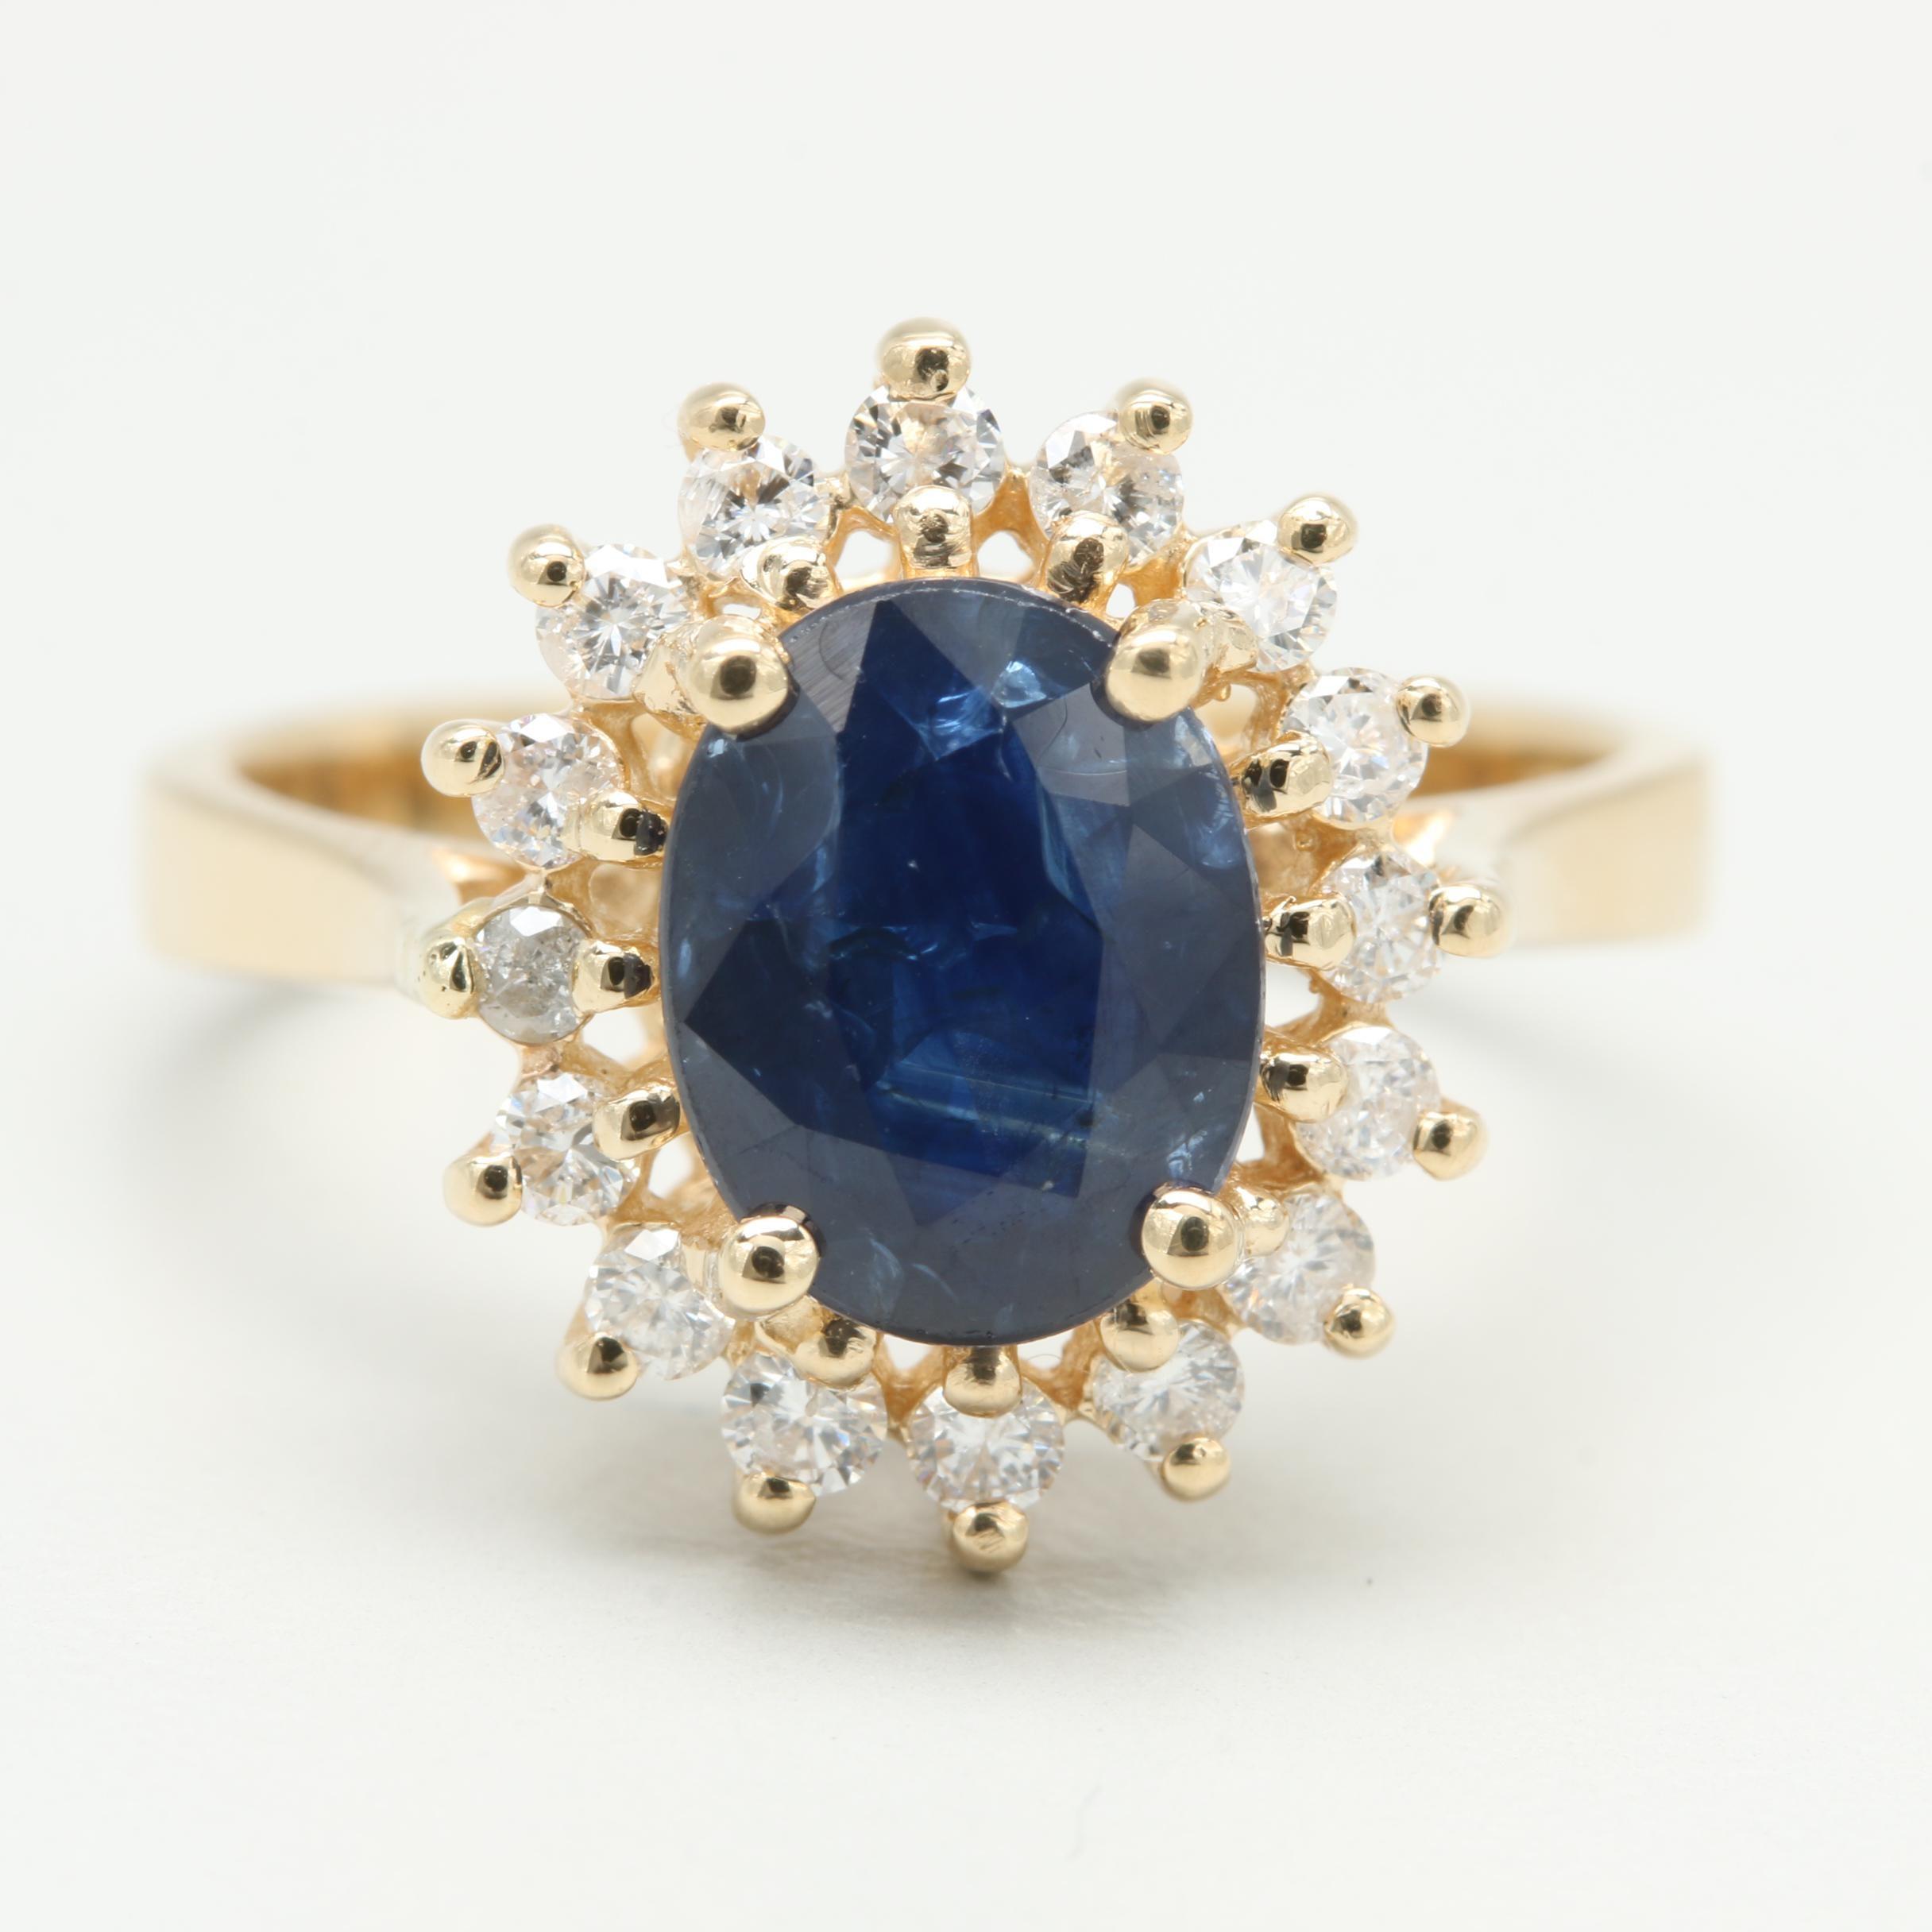 Effy 14K Yellow Gold 1.77 Ct Blue Sapphire and Diamond Ring